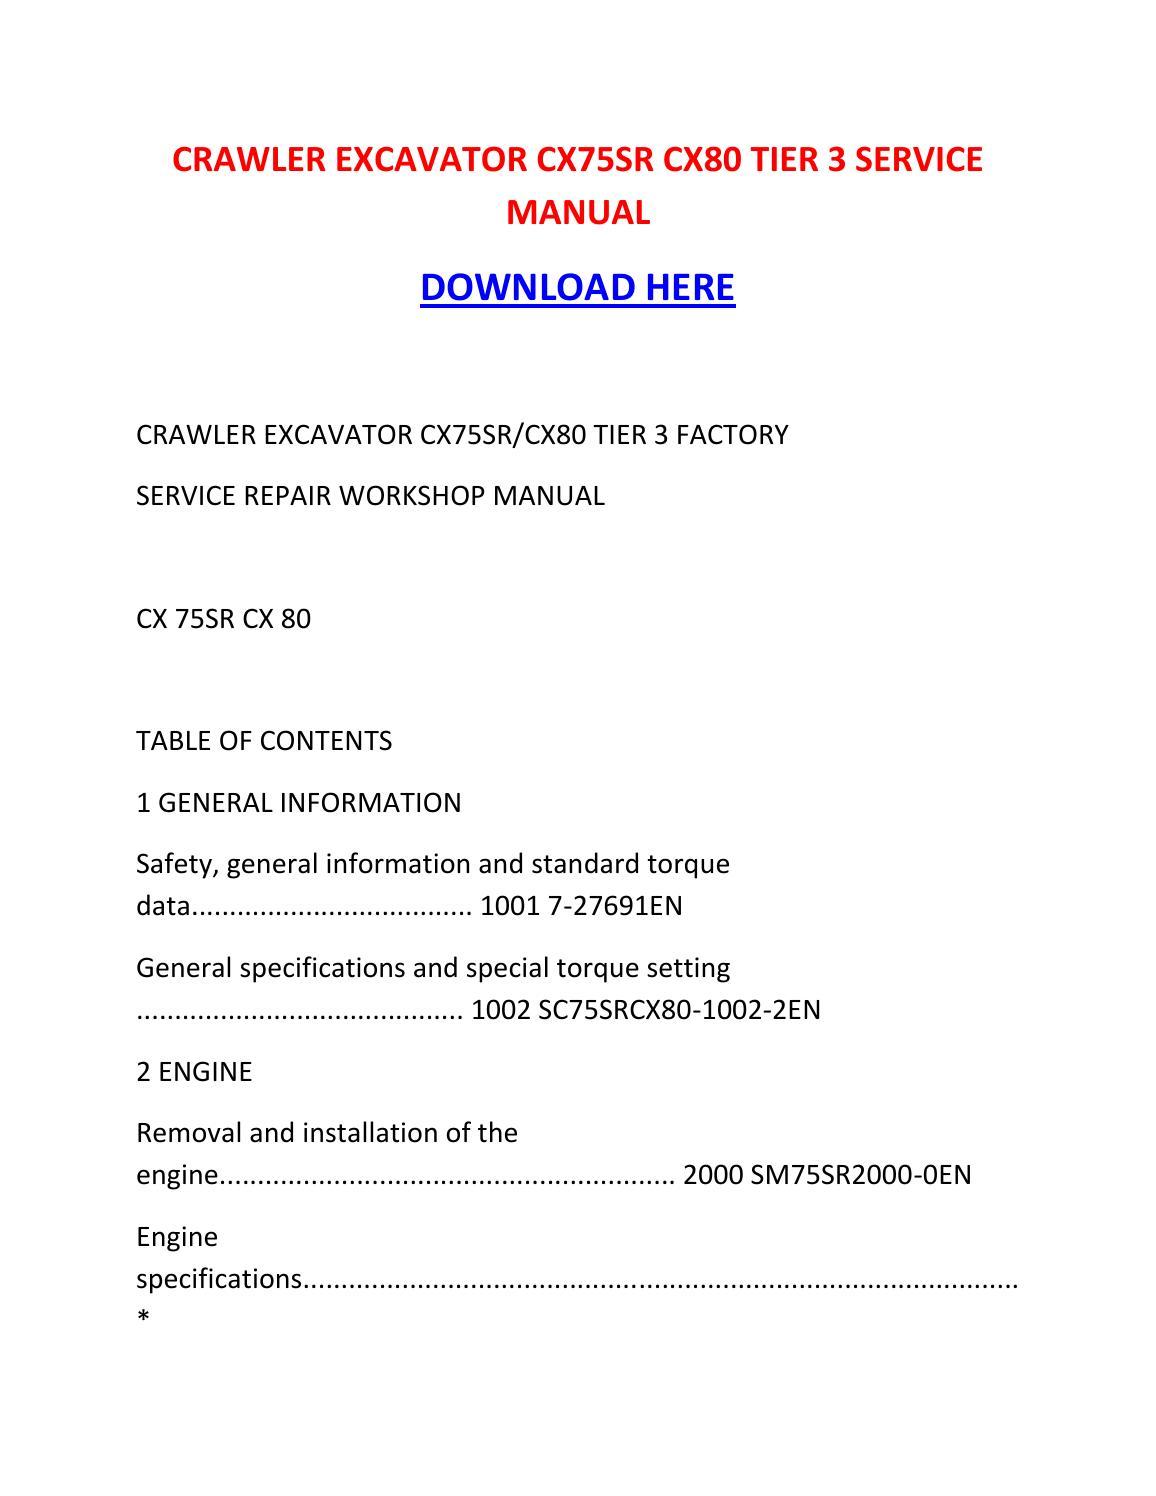 Crawler Excavator Cx75sr Cx80 Tier 3 Service Manual By